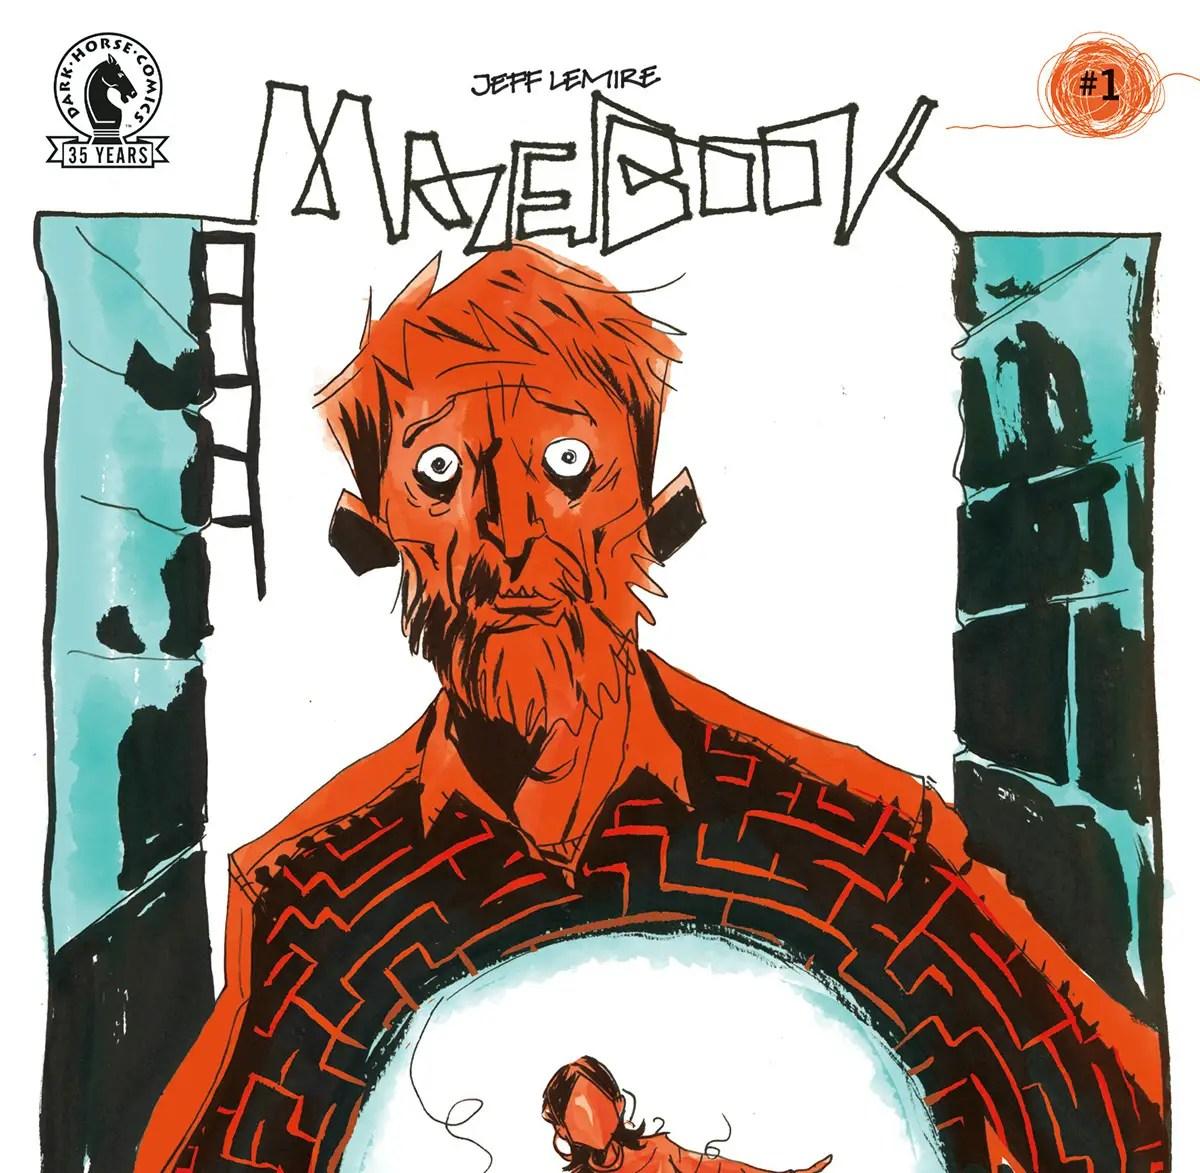 'Mazebook' #1 is deeply emotional